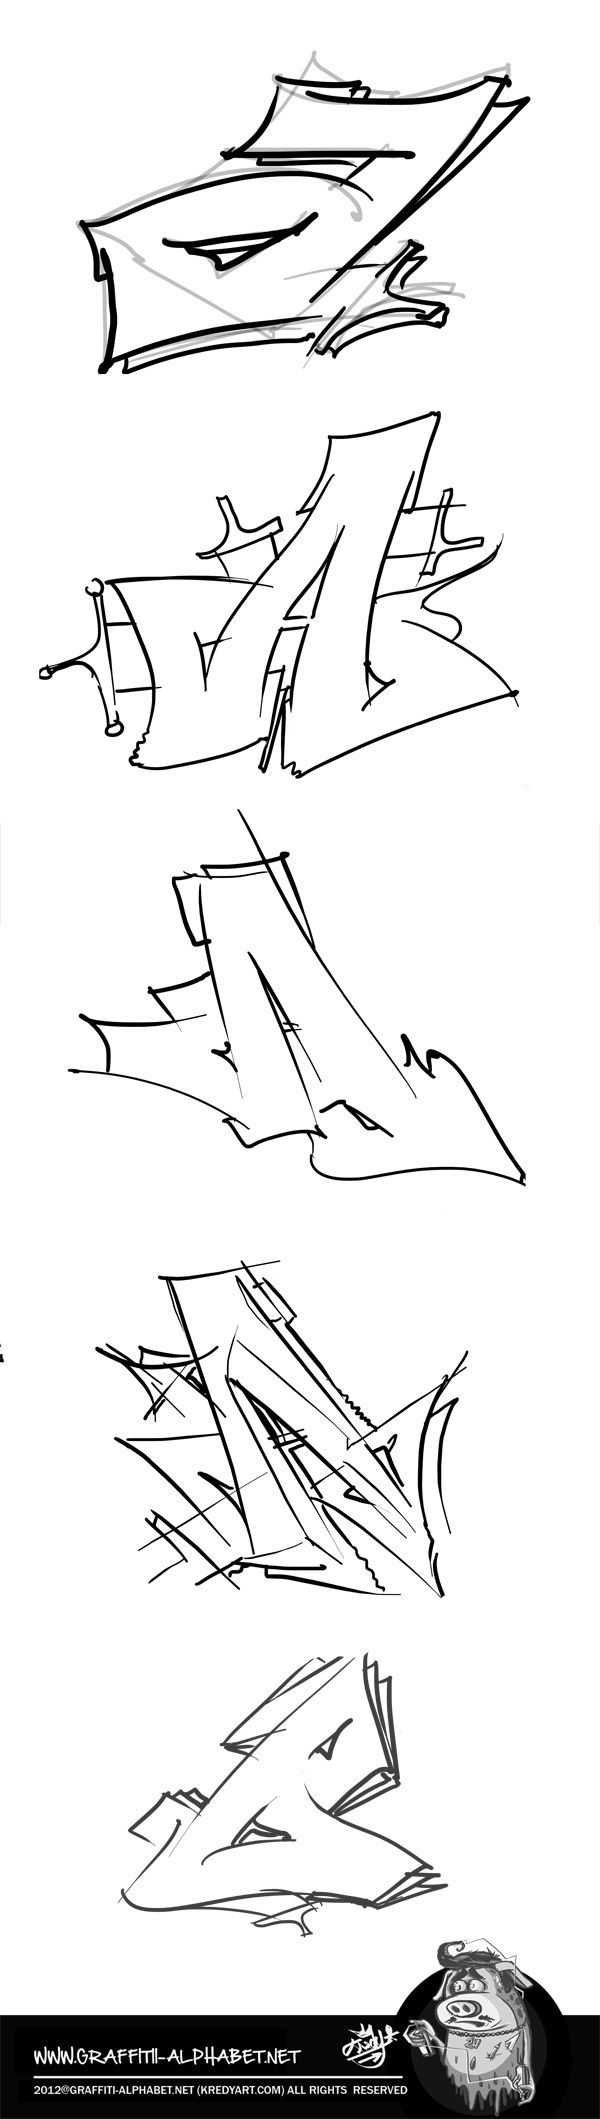 Pin by Migdalia on anime Graffiti alphabet, Graffiti